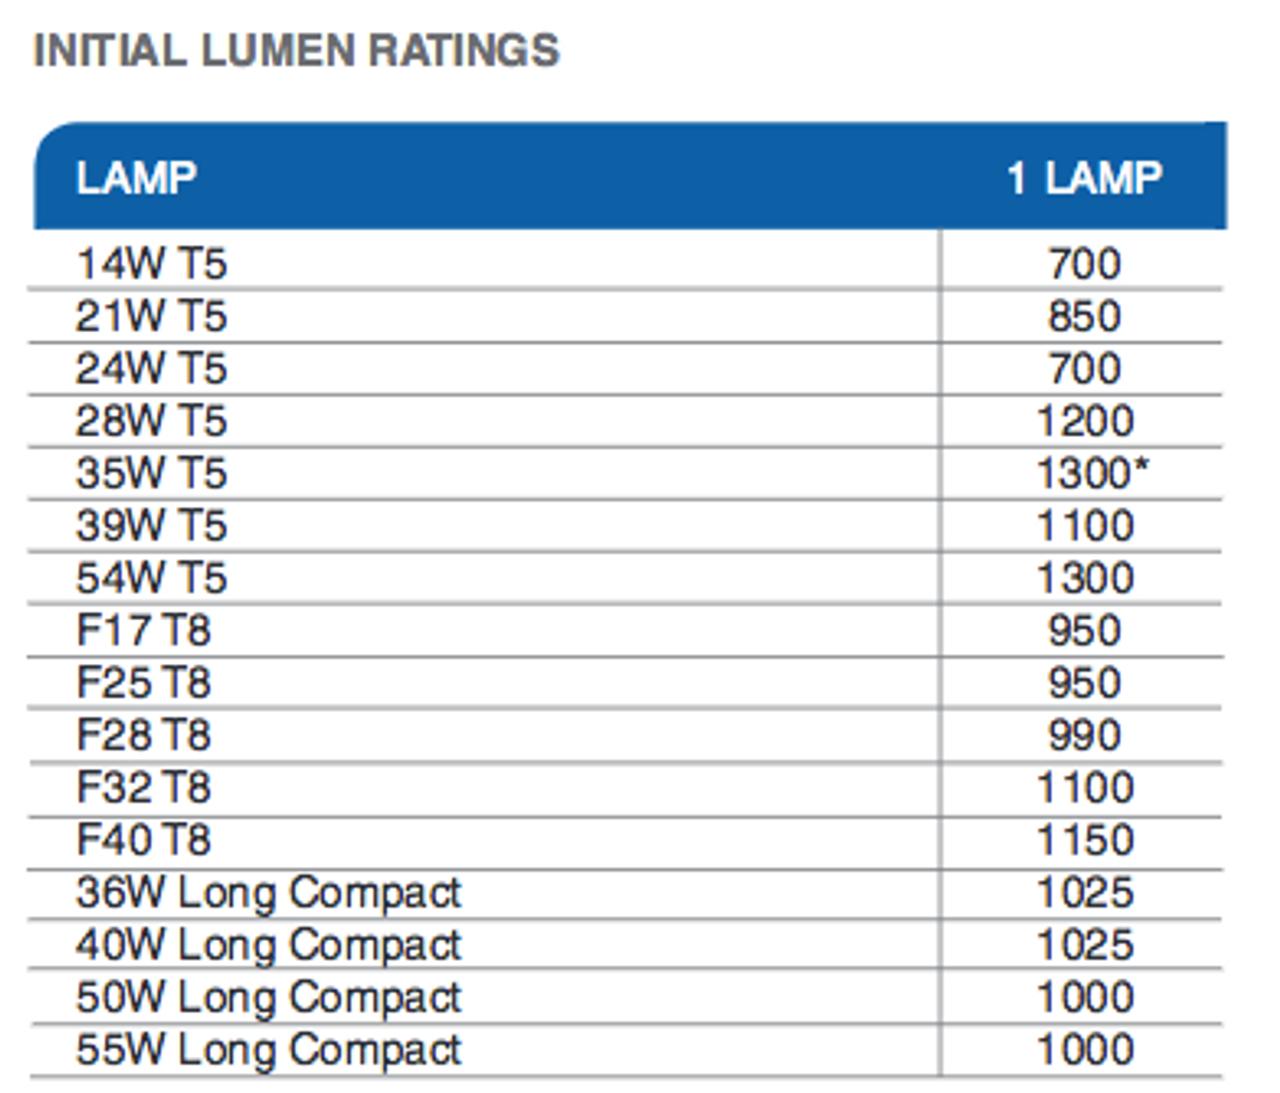 Fabulous Isl 540 Ballast Wiring Diagram Basic Electronics Wiring Diagram Wiring 101 Mecadwellnesstrialsorg